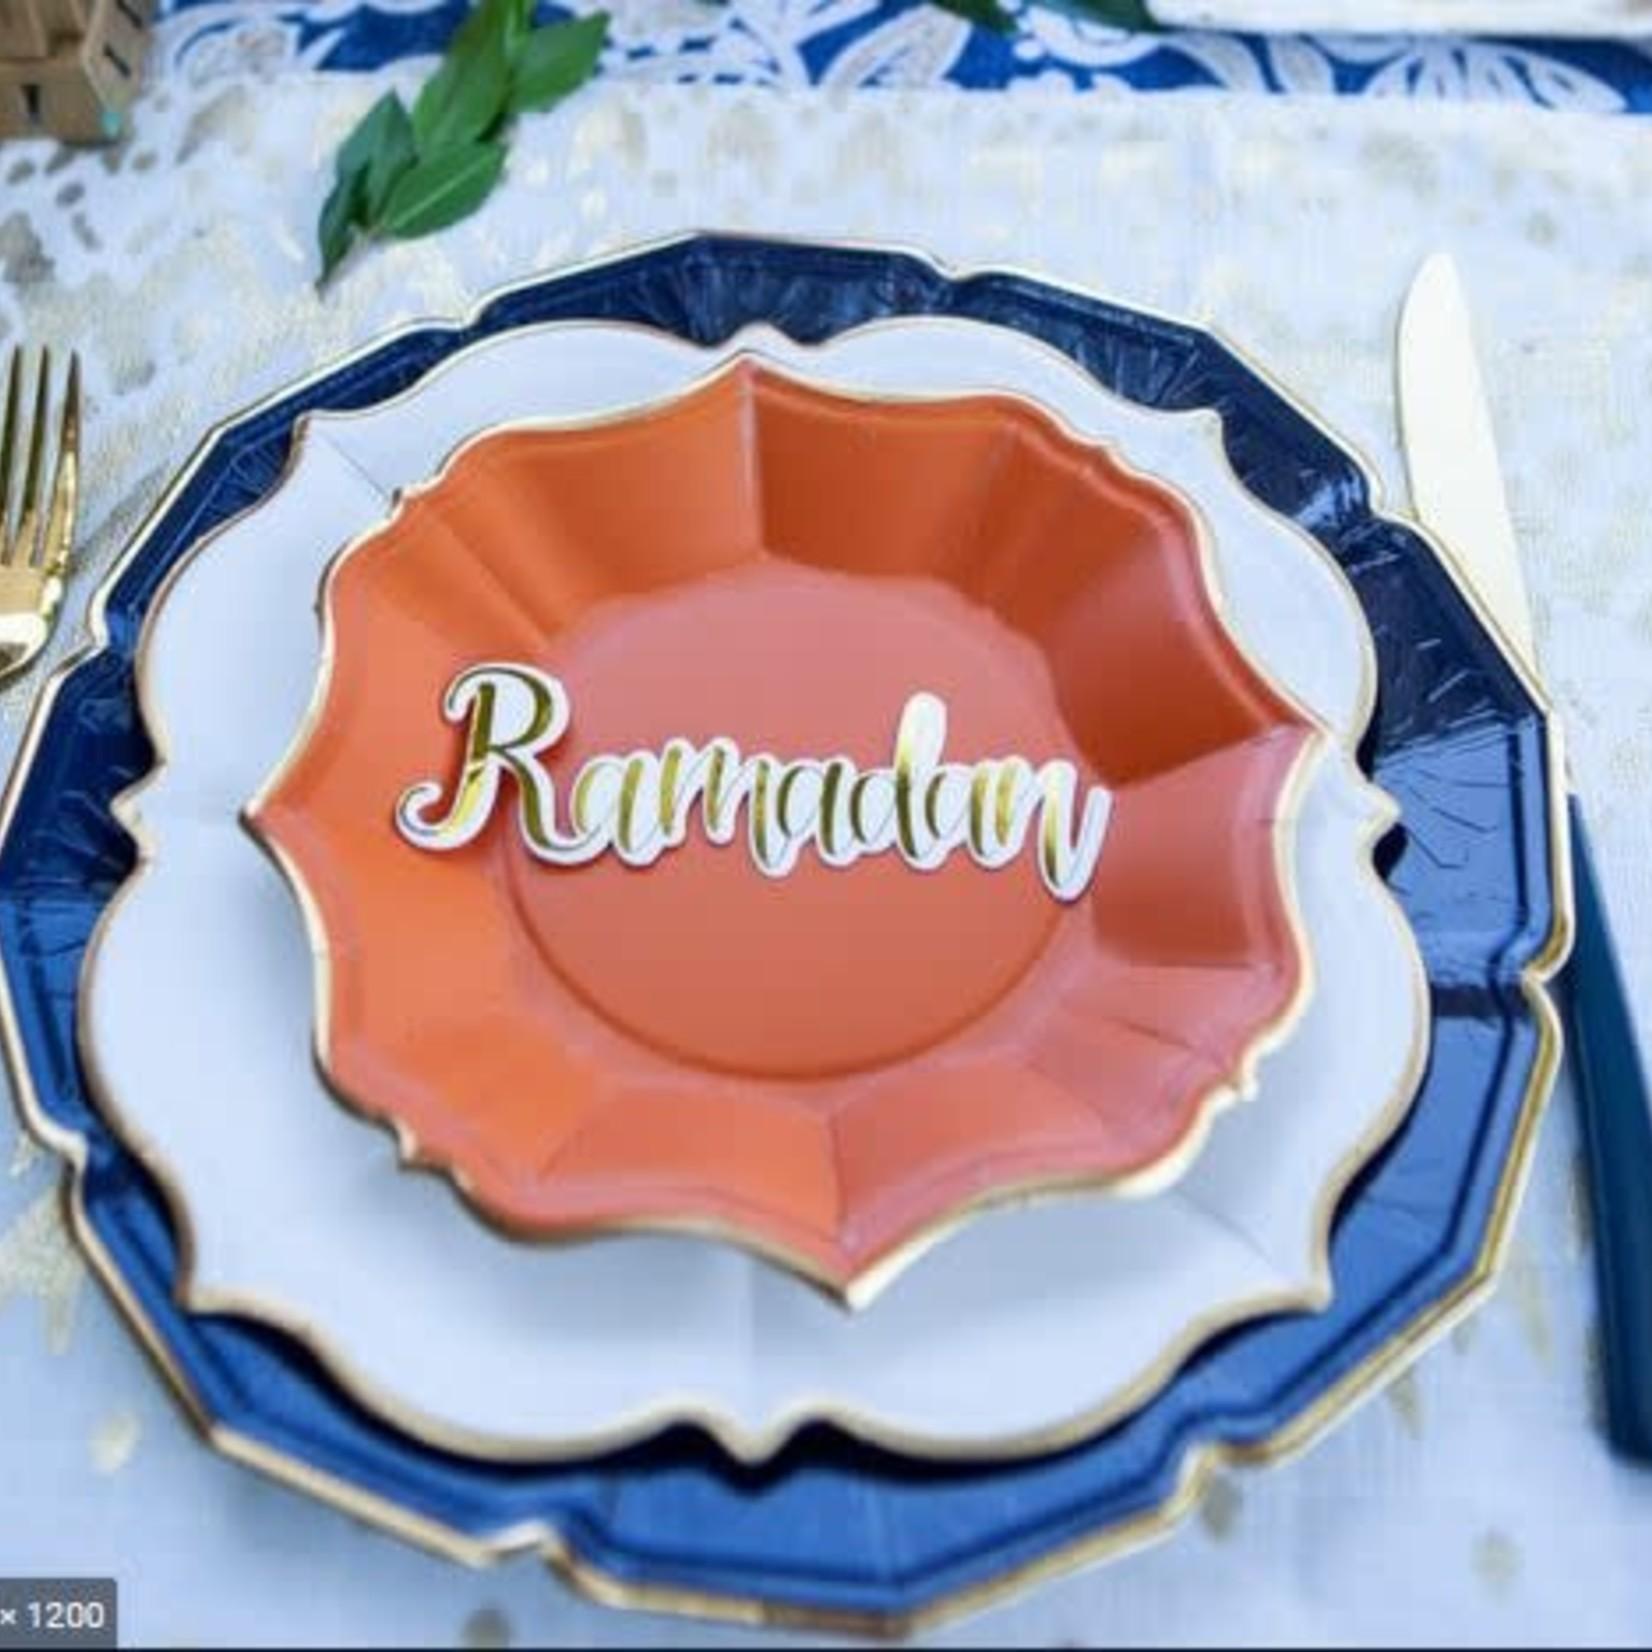 Eid Creations Marrakesh Lunch Plates